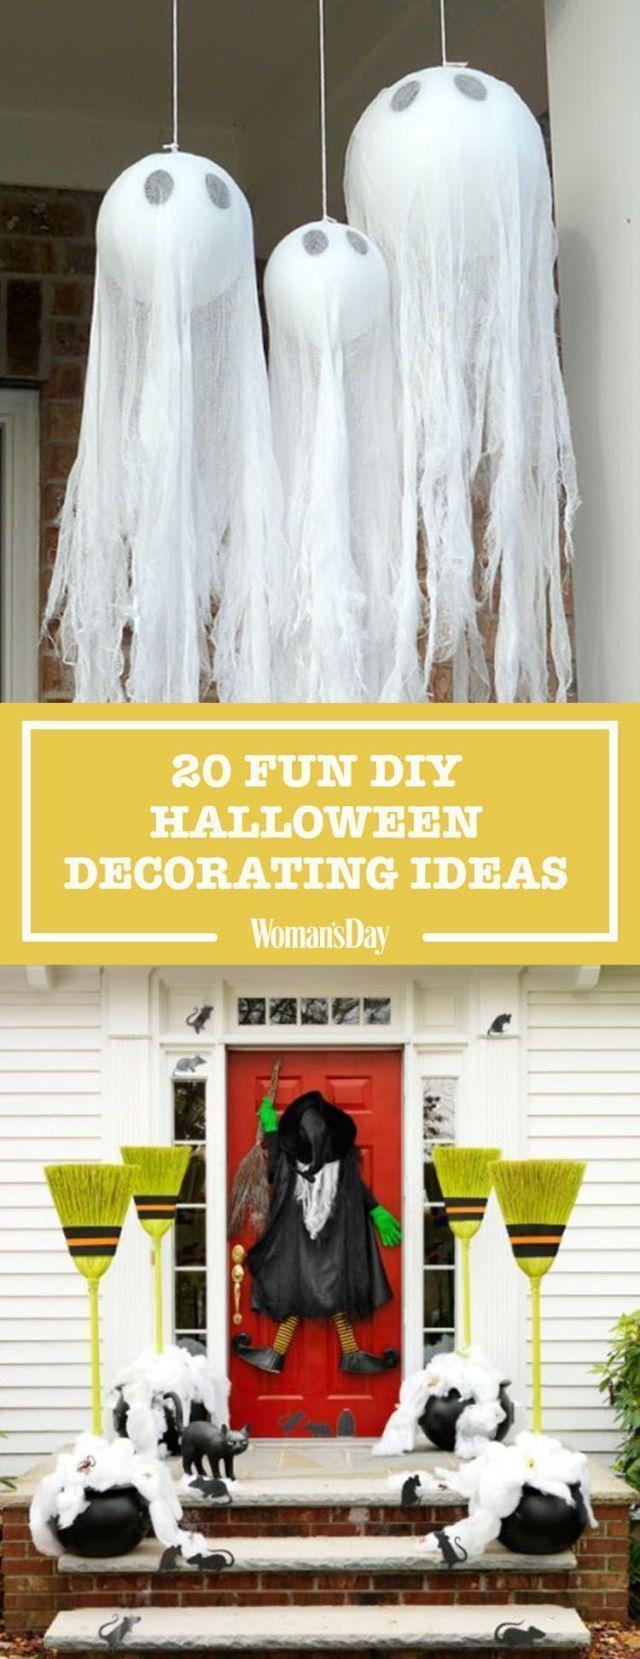 40+ Easy DIY Halloween Decoration Ideas - Homemade Halloween Decor Projects #halloweendecorationideas #halloweendecorating #halloweendecorations